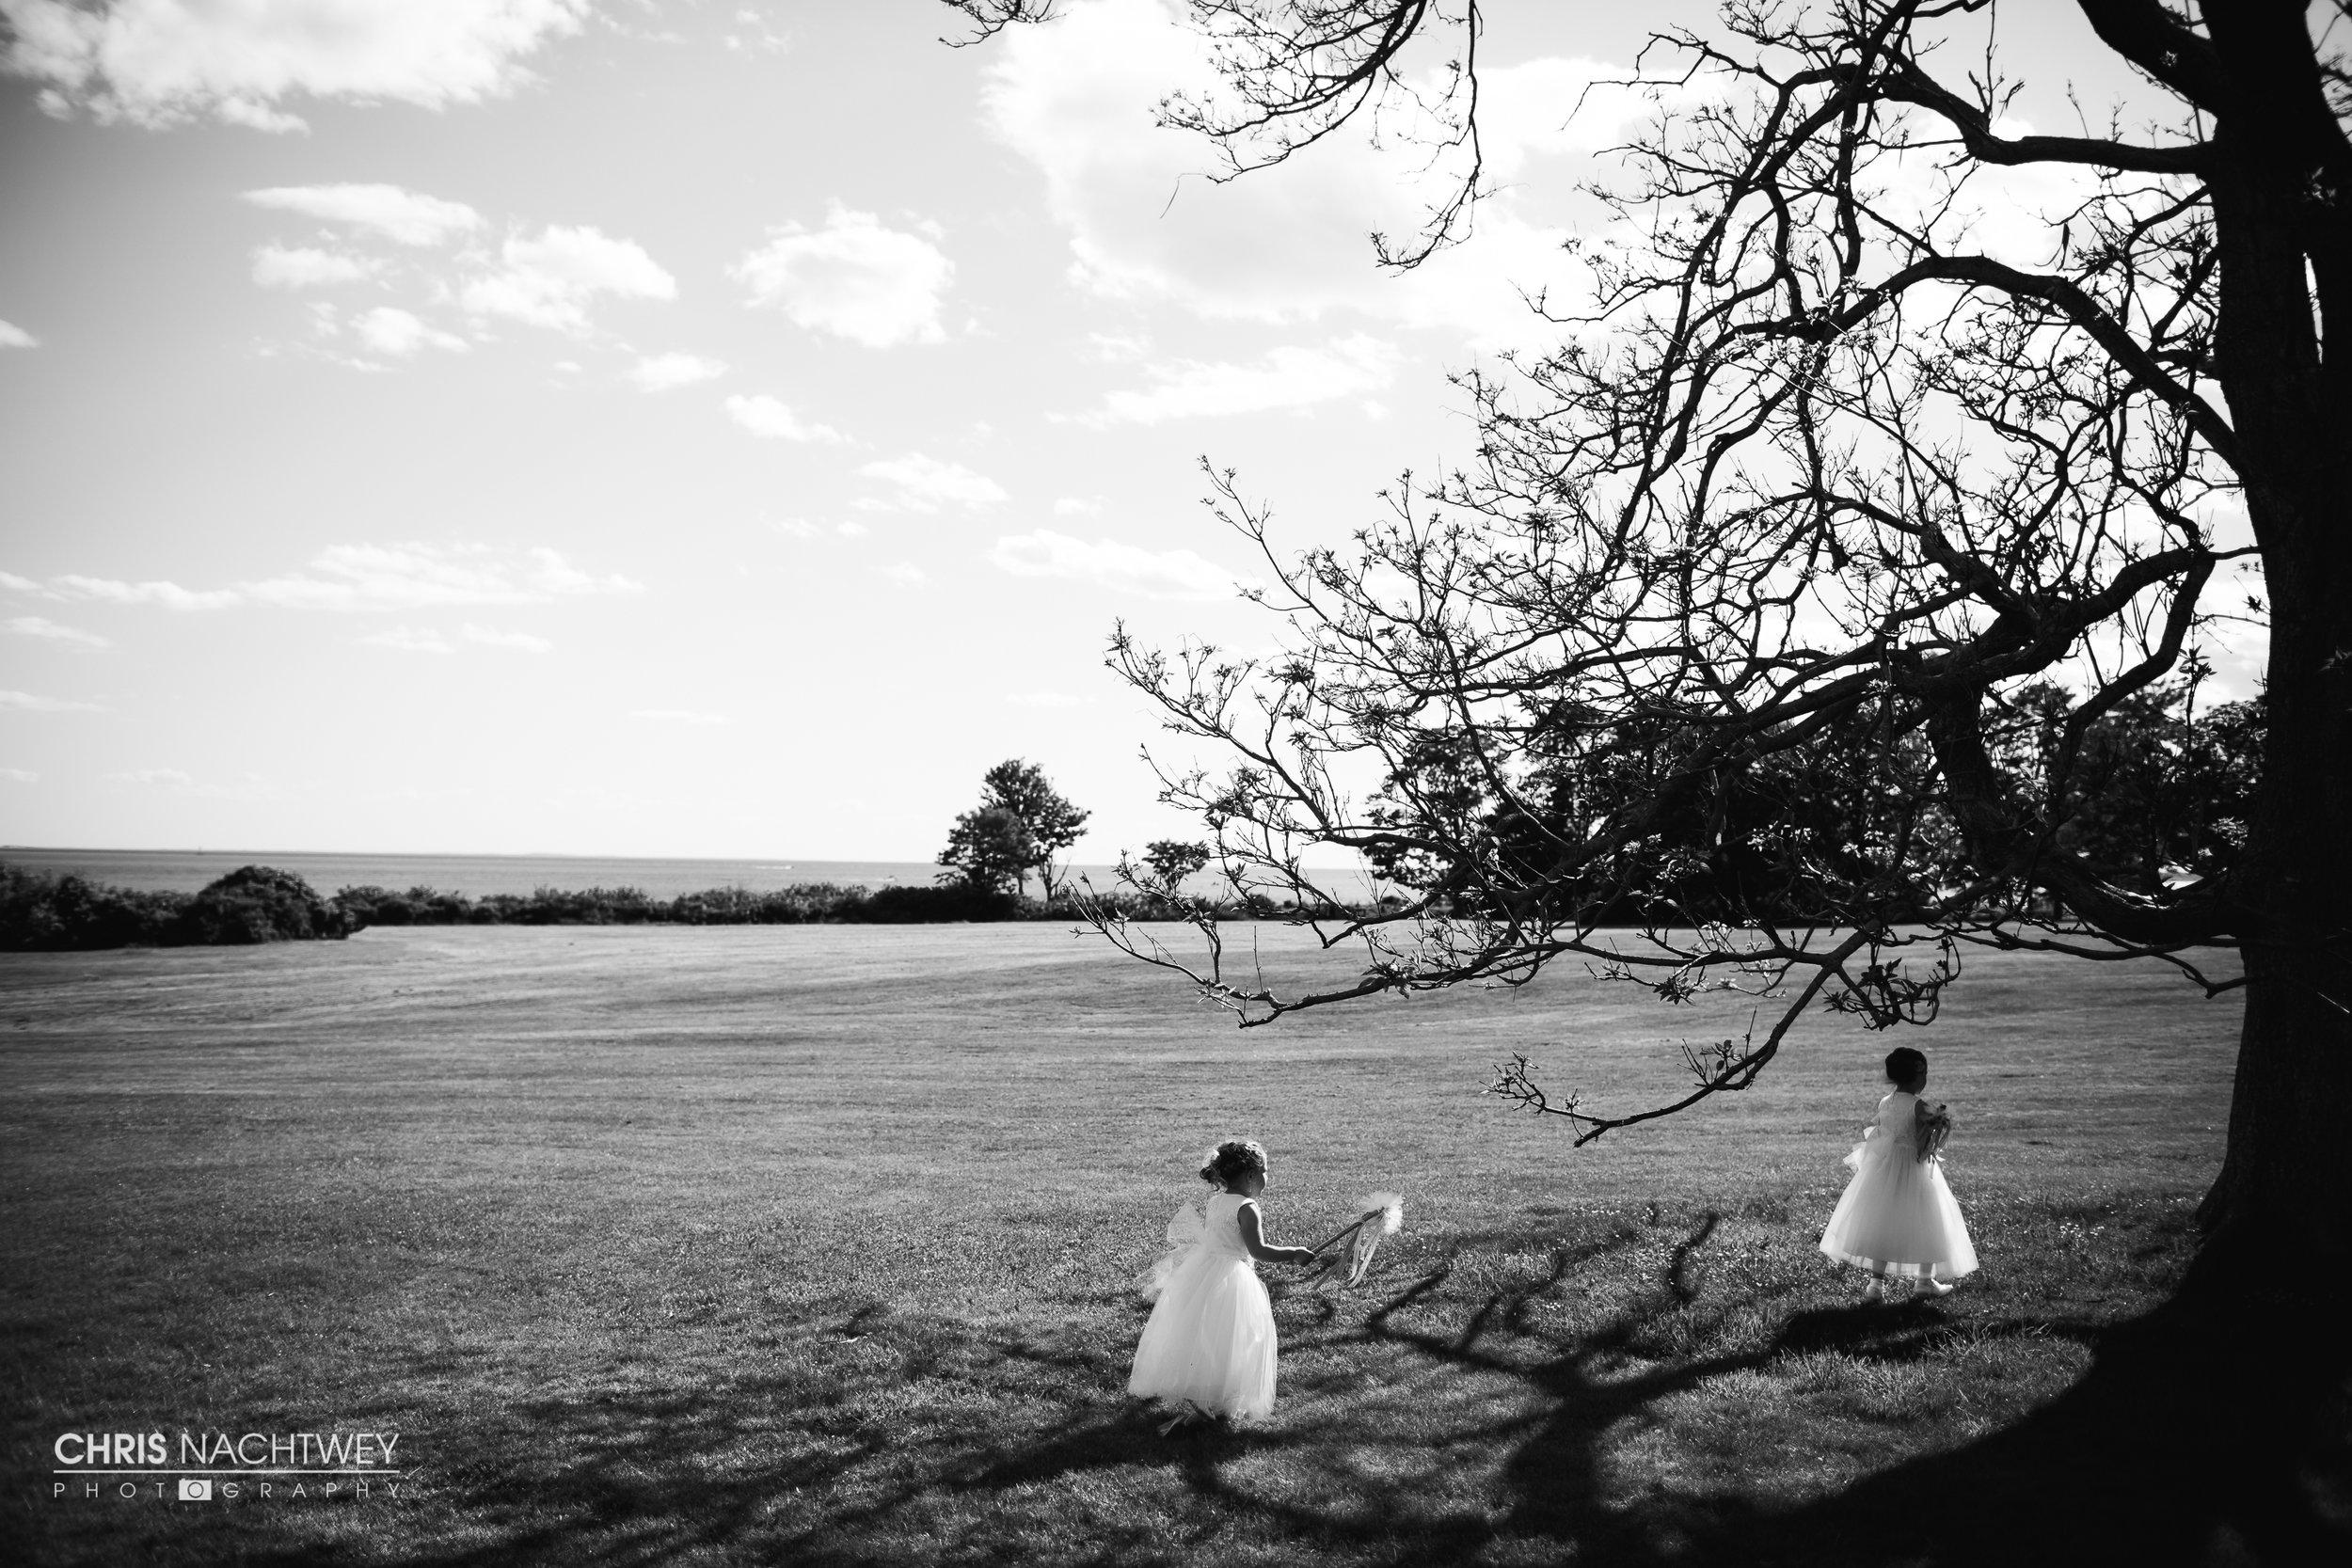 mystic-artistic-wedding-photographer-chris-nachtwey-2017-17.jpg